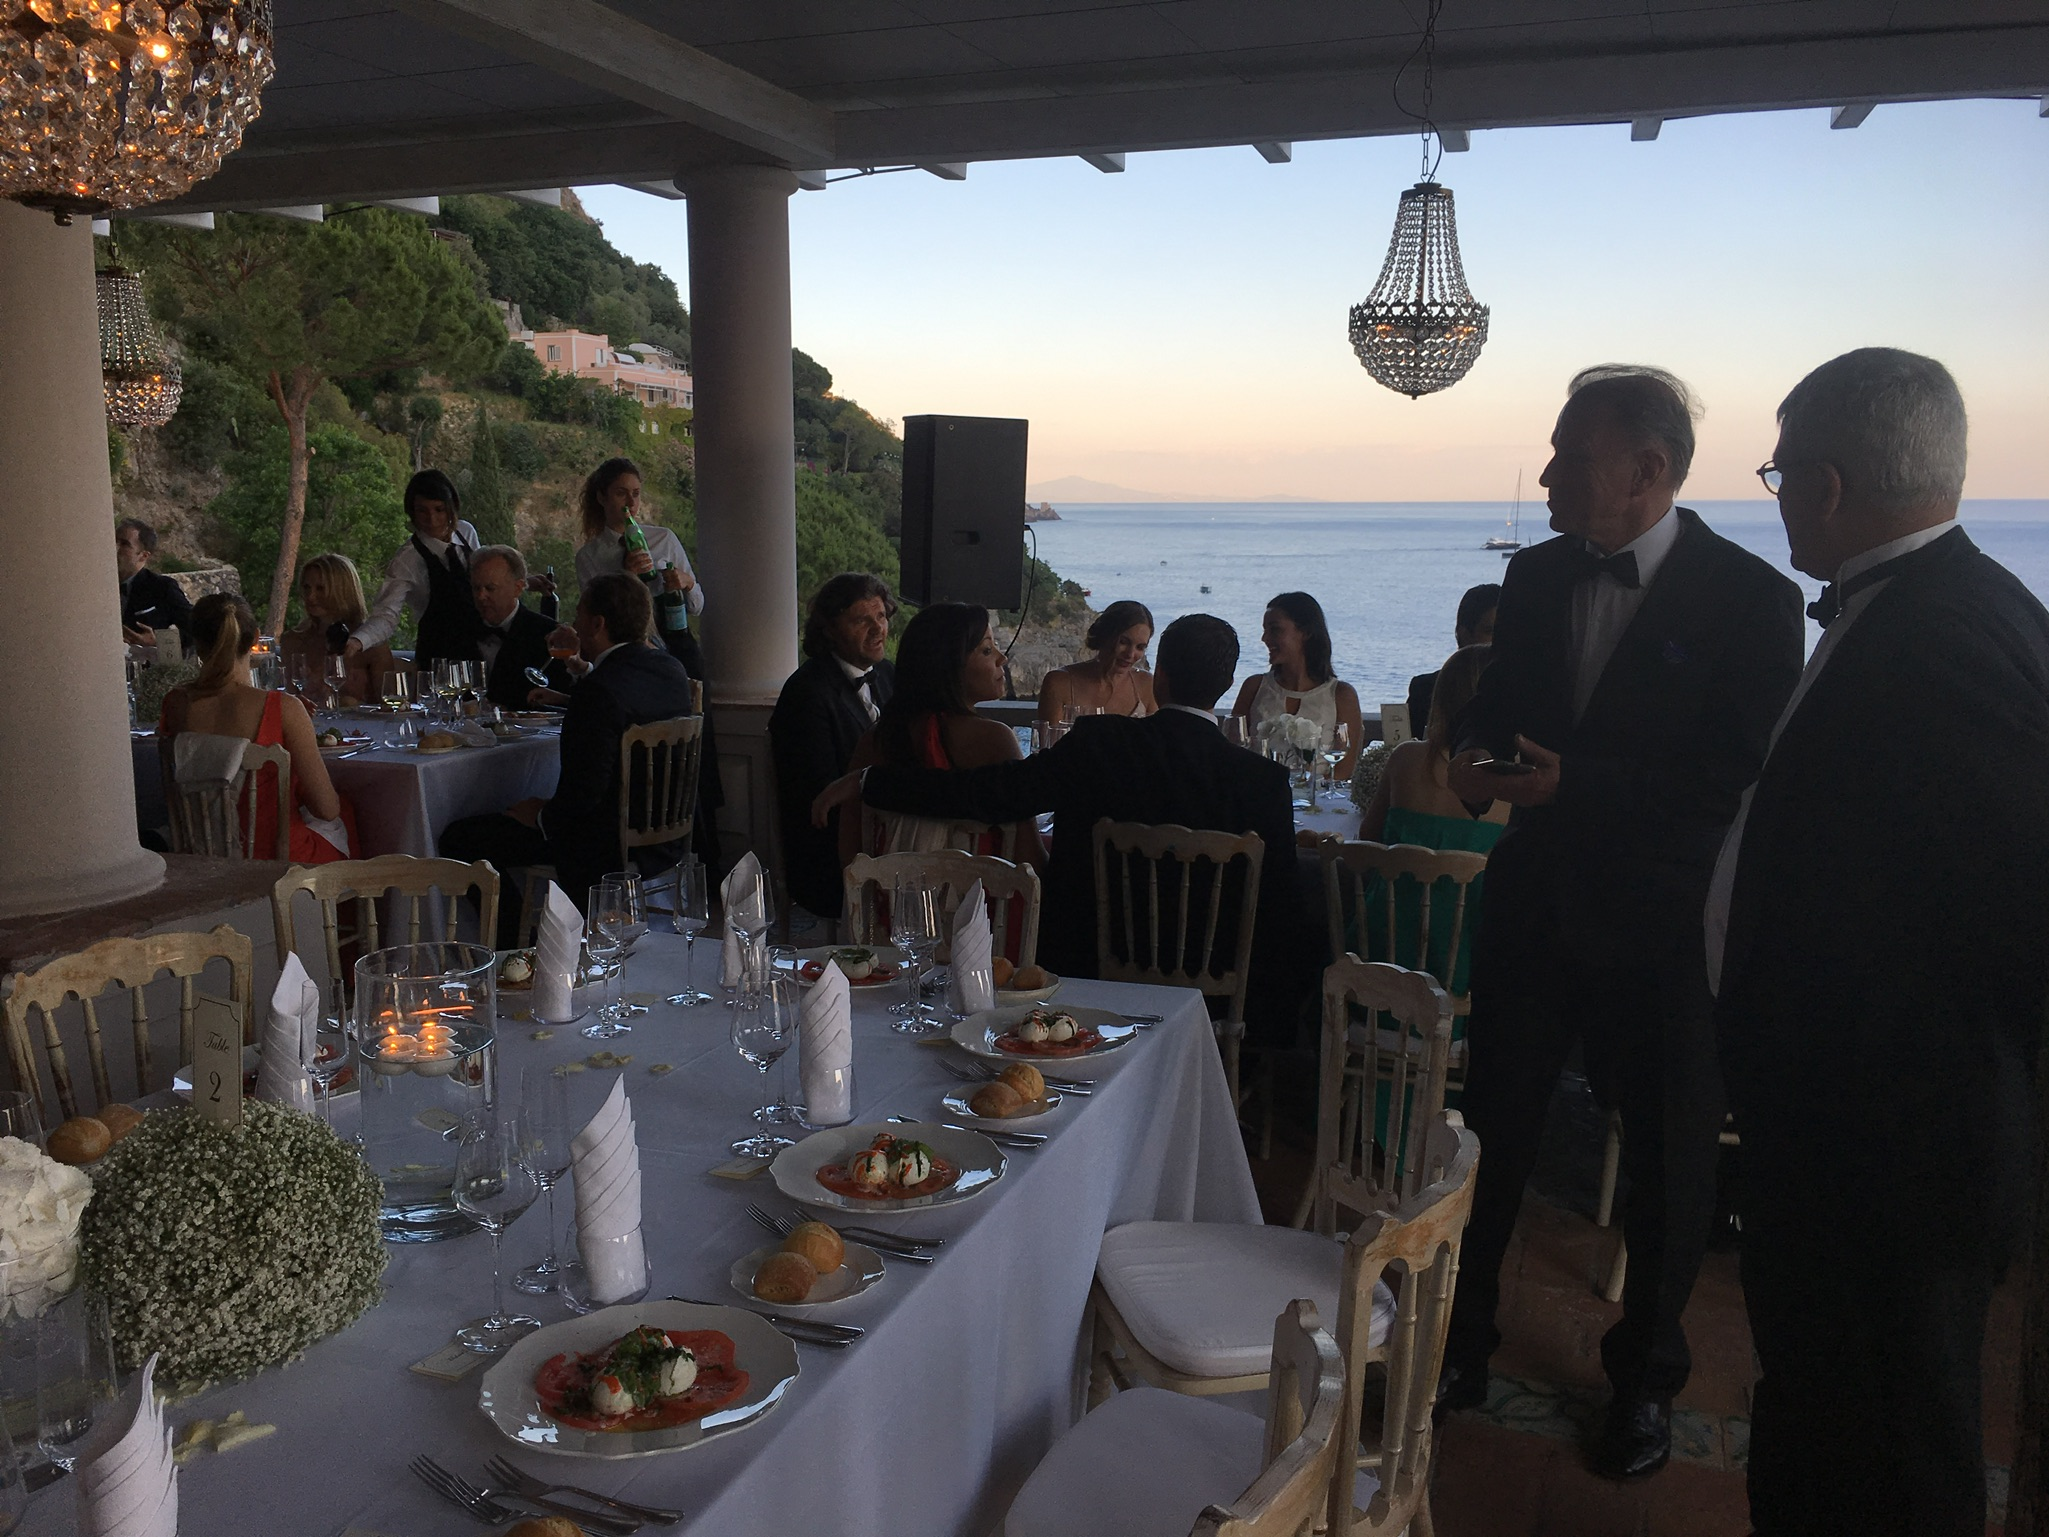 https://www.weddingamalfi.com/wp-content/uploads/Nathalie-and-Benjamin-Wedding-in-Positano-Italy-2.jpg